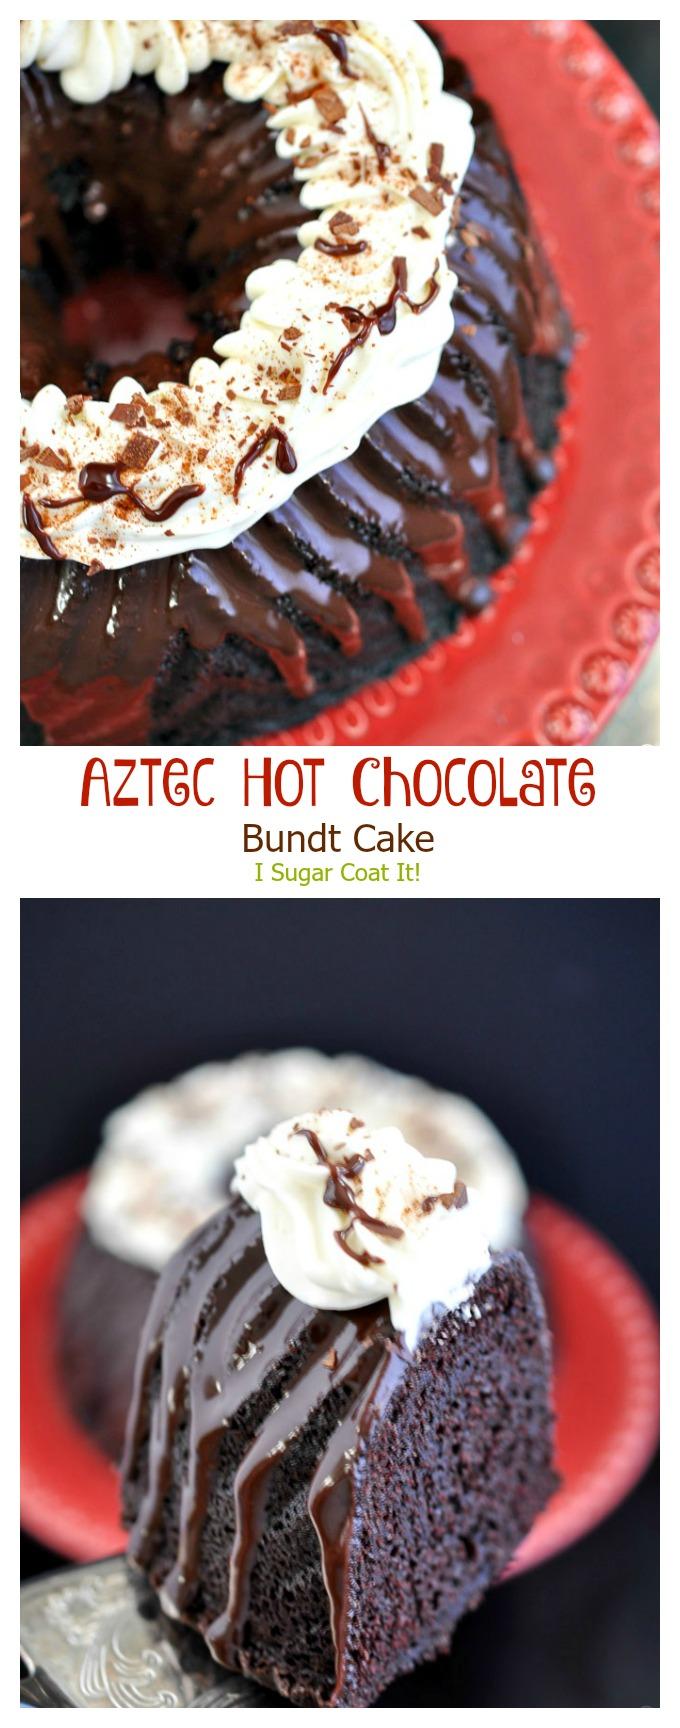 Aztec Hot Chocolate Bundt Cake